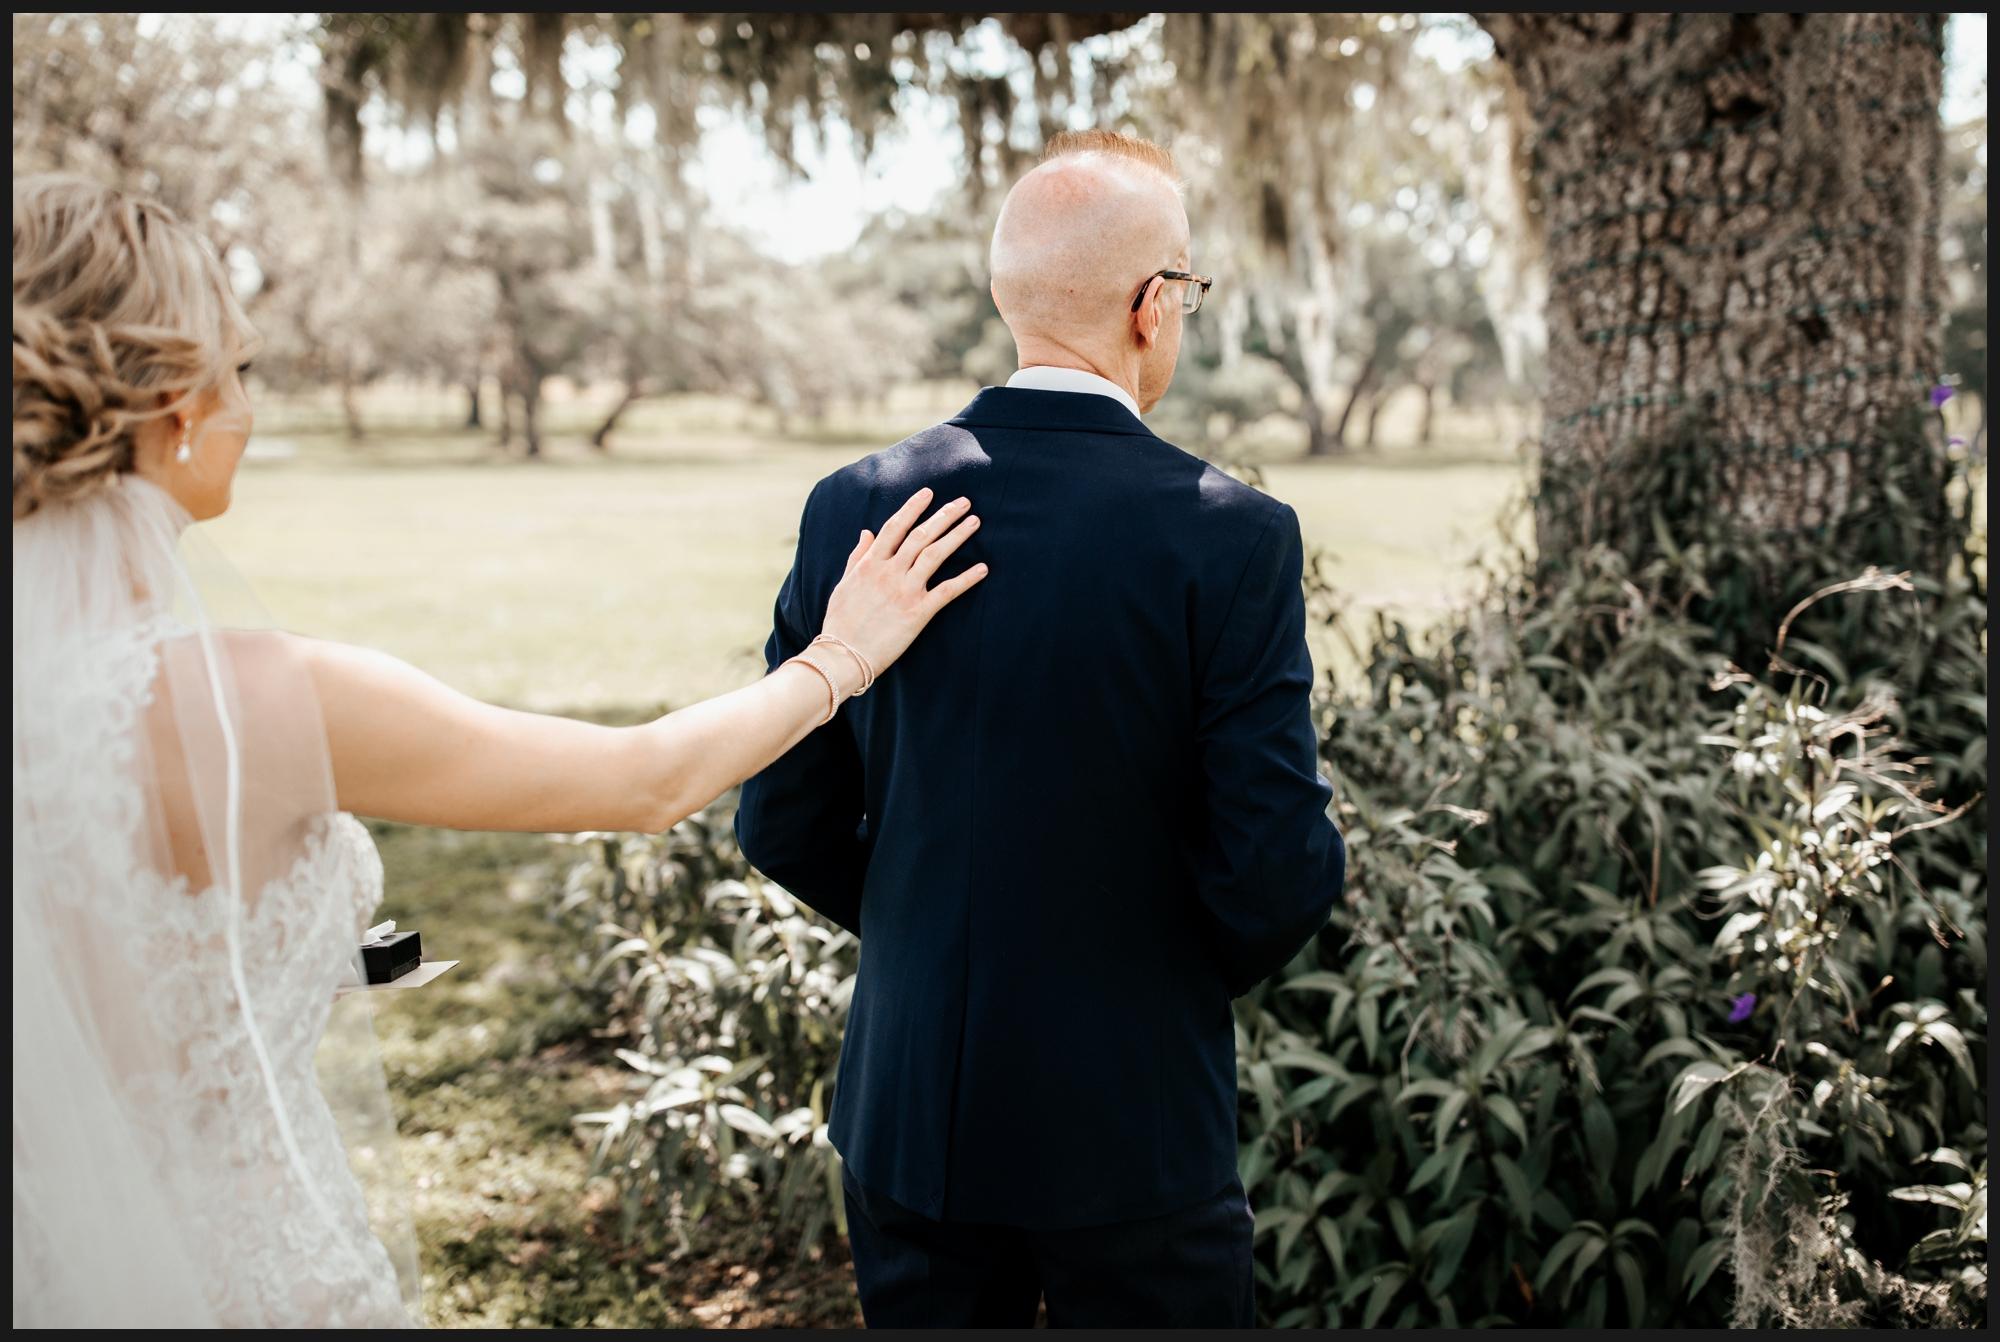 Orlando-Wedding-Photographer-destination-wedding-photographer-florida-wedding-photographer-hawaii-wedding-photographer_0588.jpg